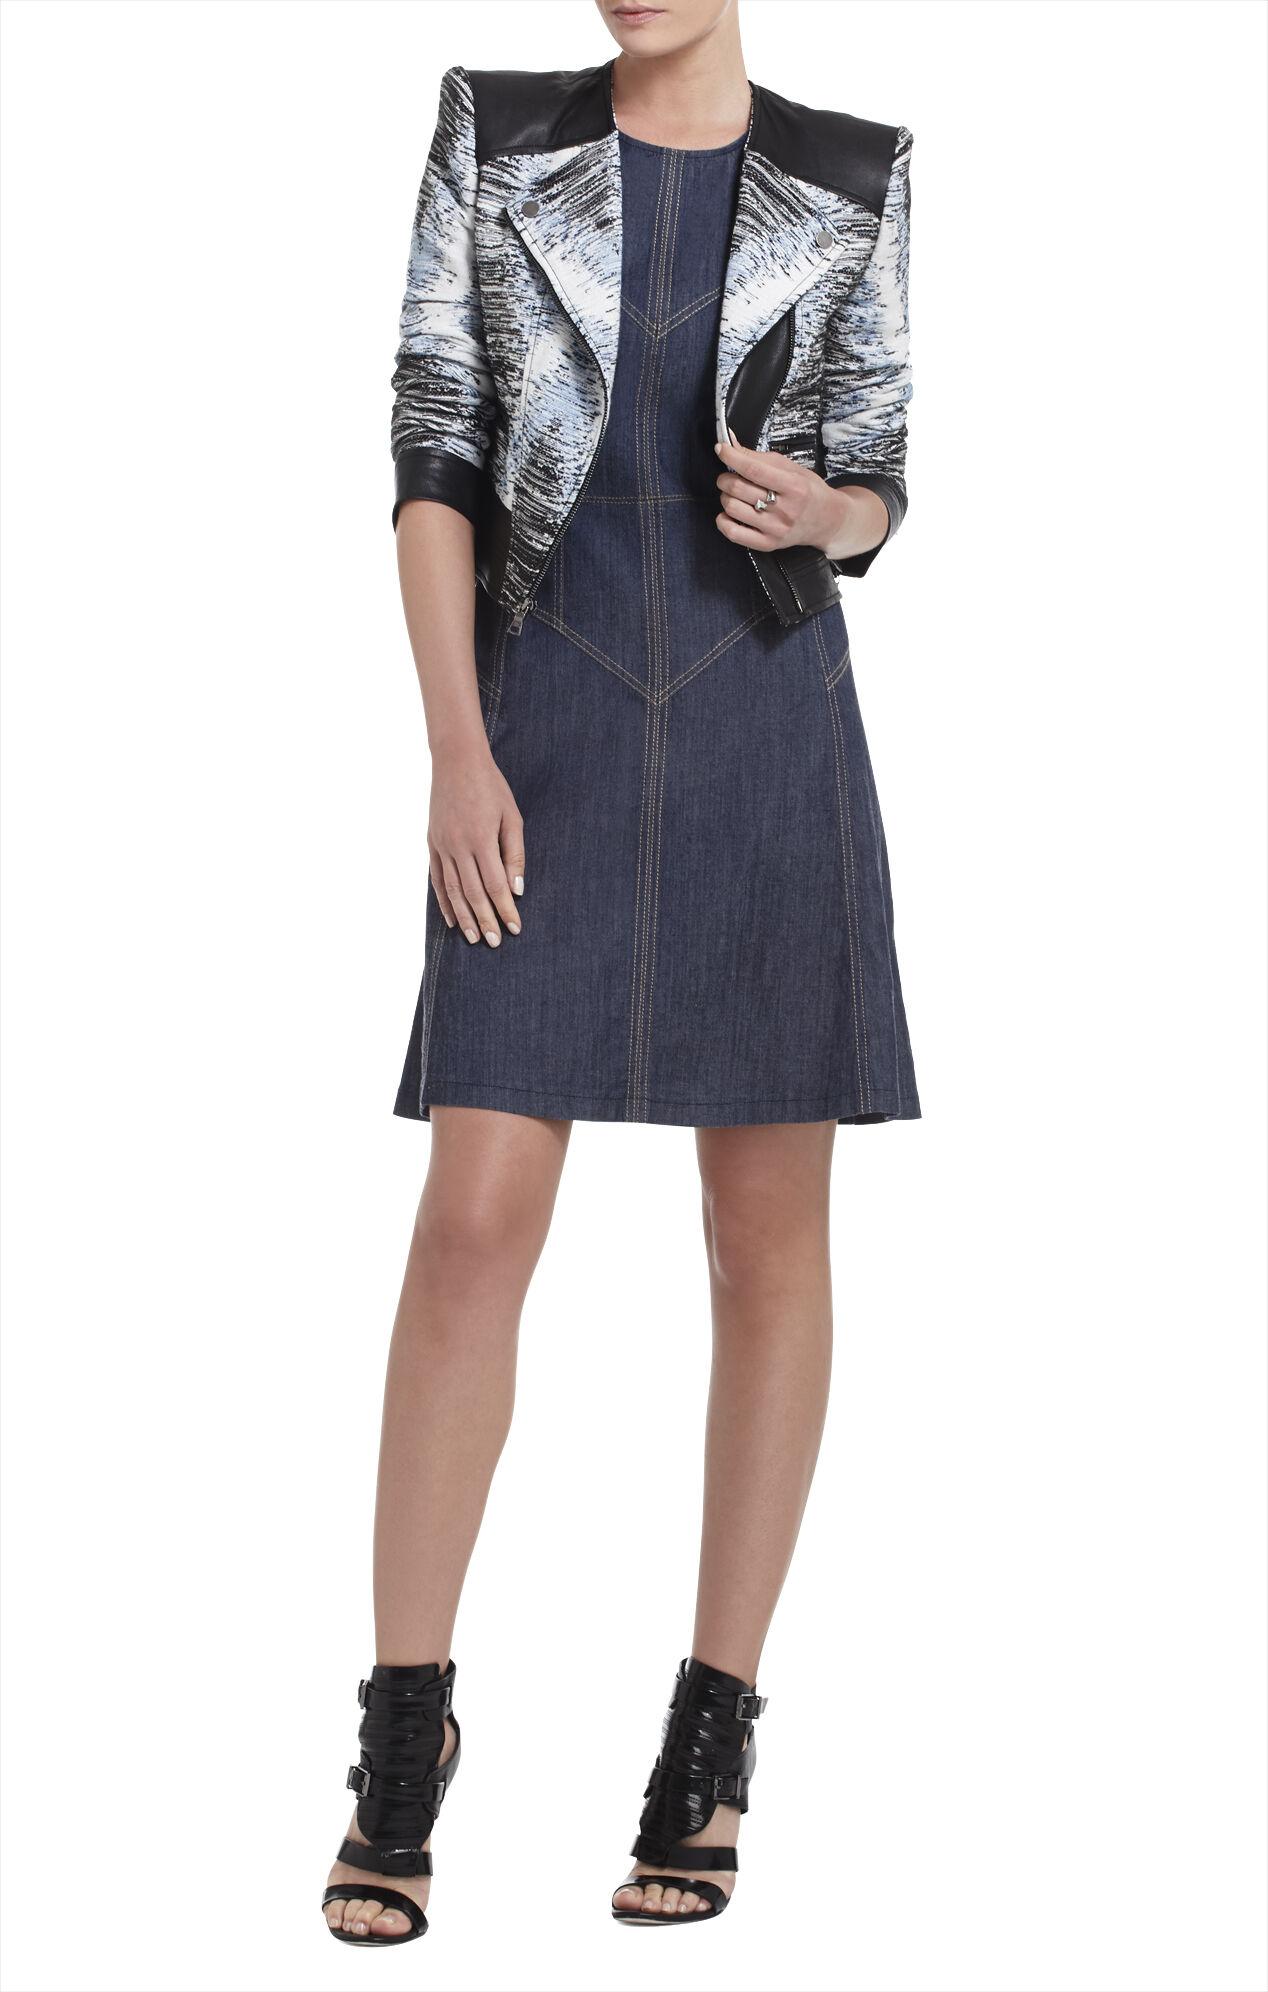 Katie Sleeveless Paneled Dress